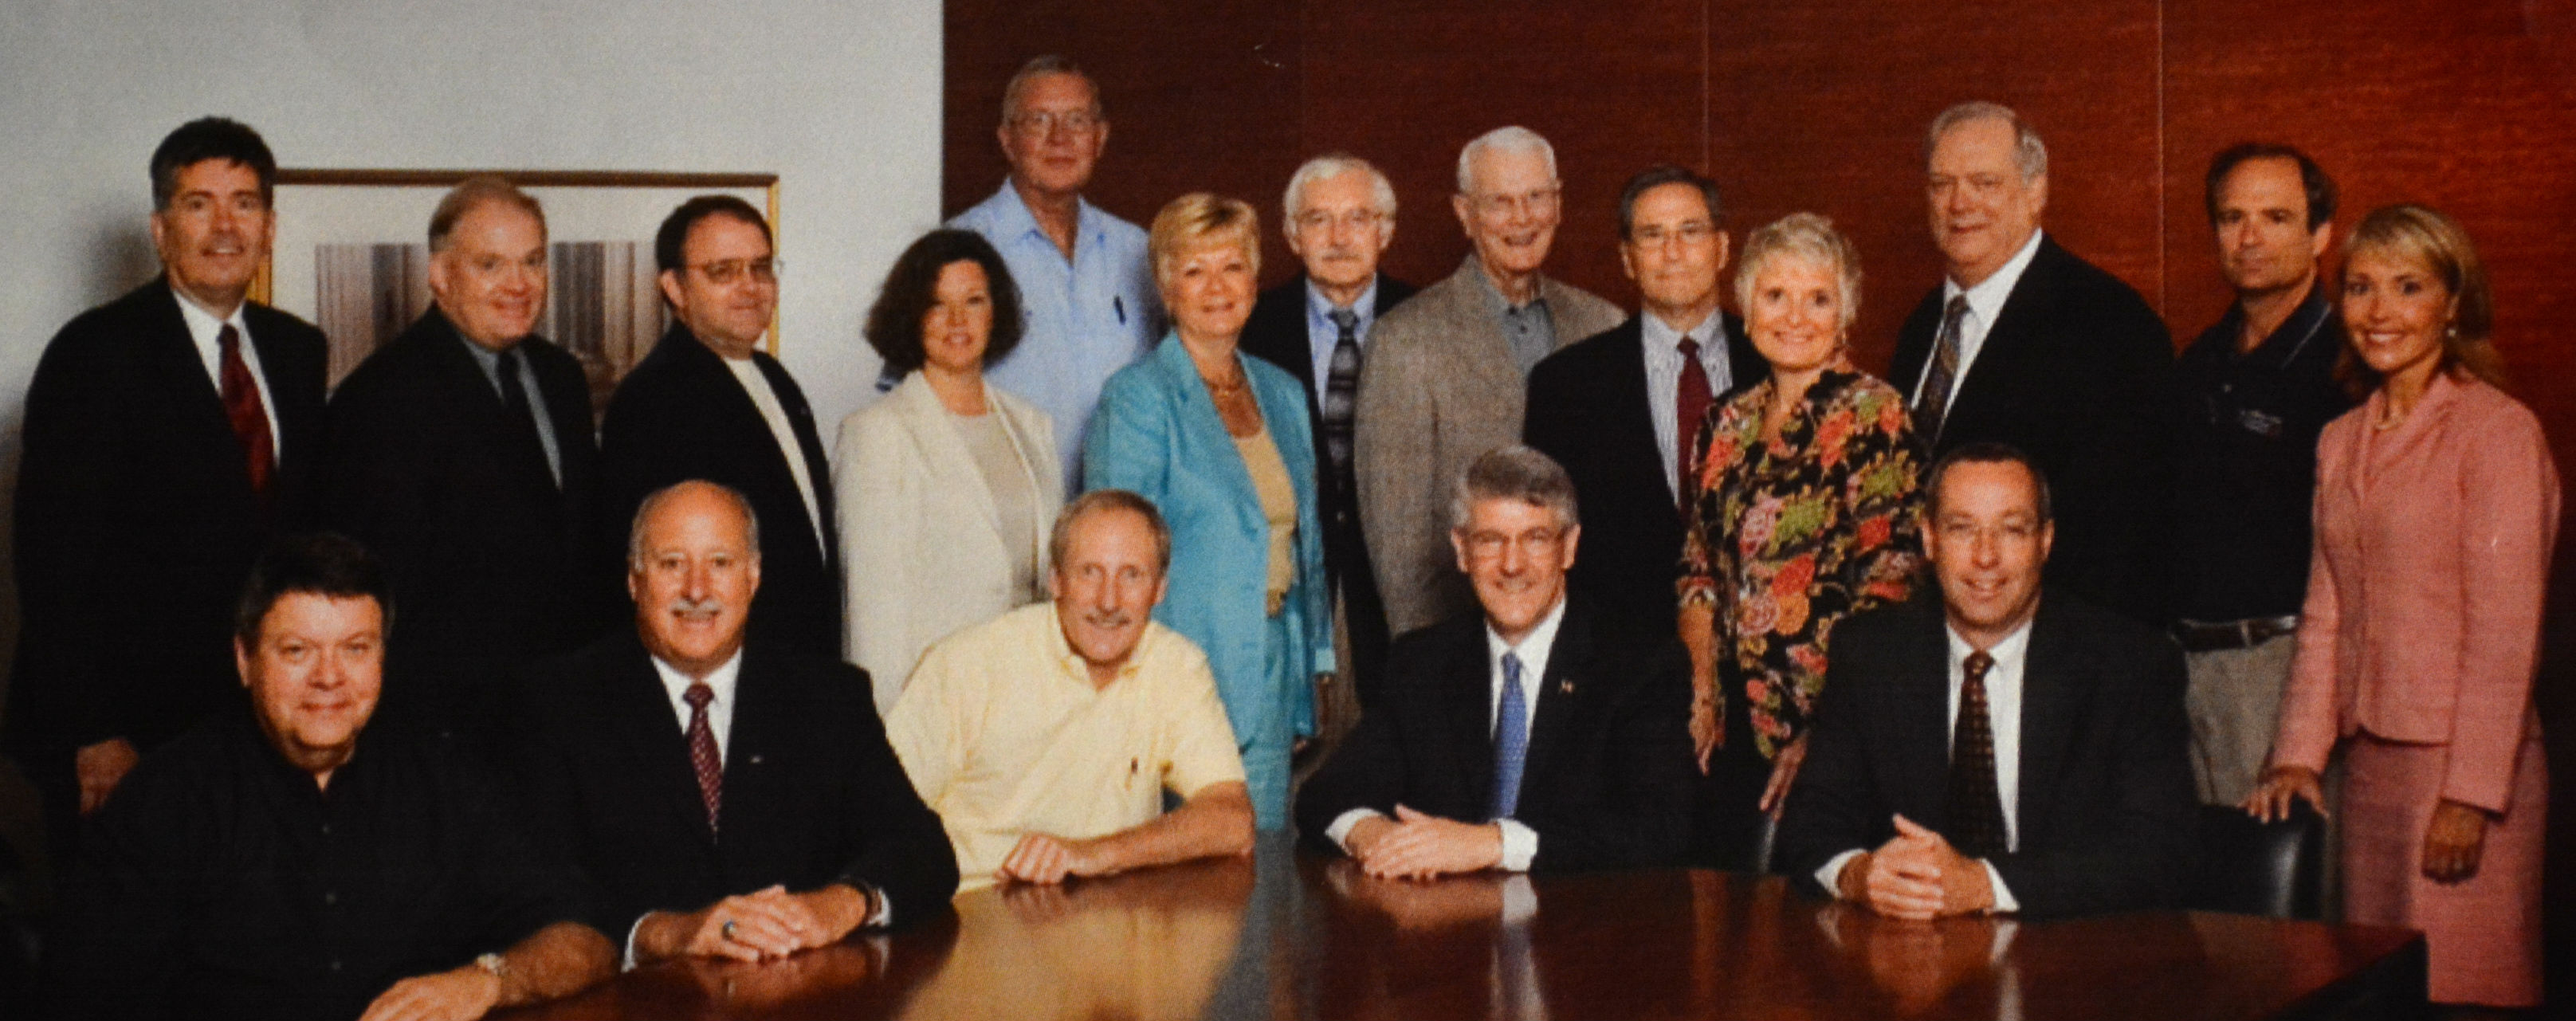 Founding Members of the Regional Partnership